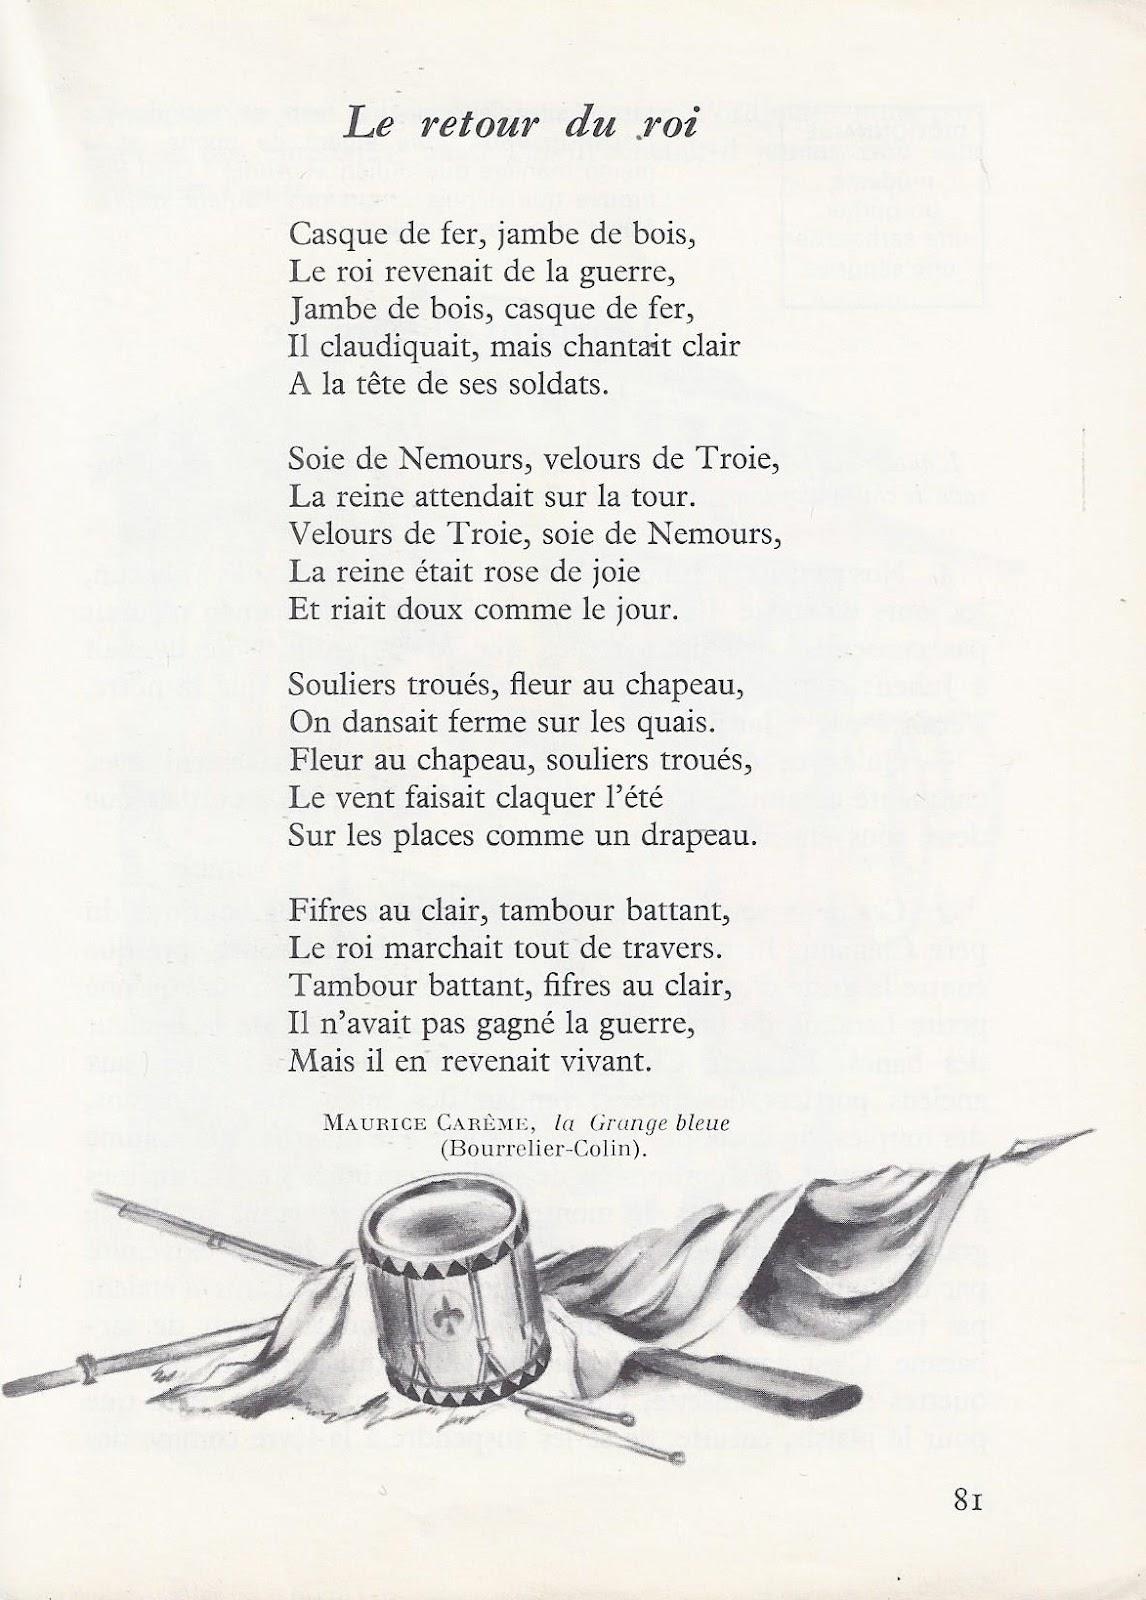 Poesie L Ecole De Maurice Careme : poesie, ecole, maurice, careme, école, Références:, Retour, (Maurice, Carême)